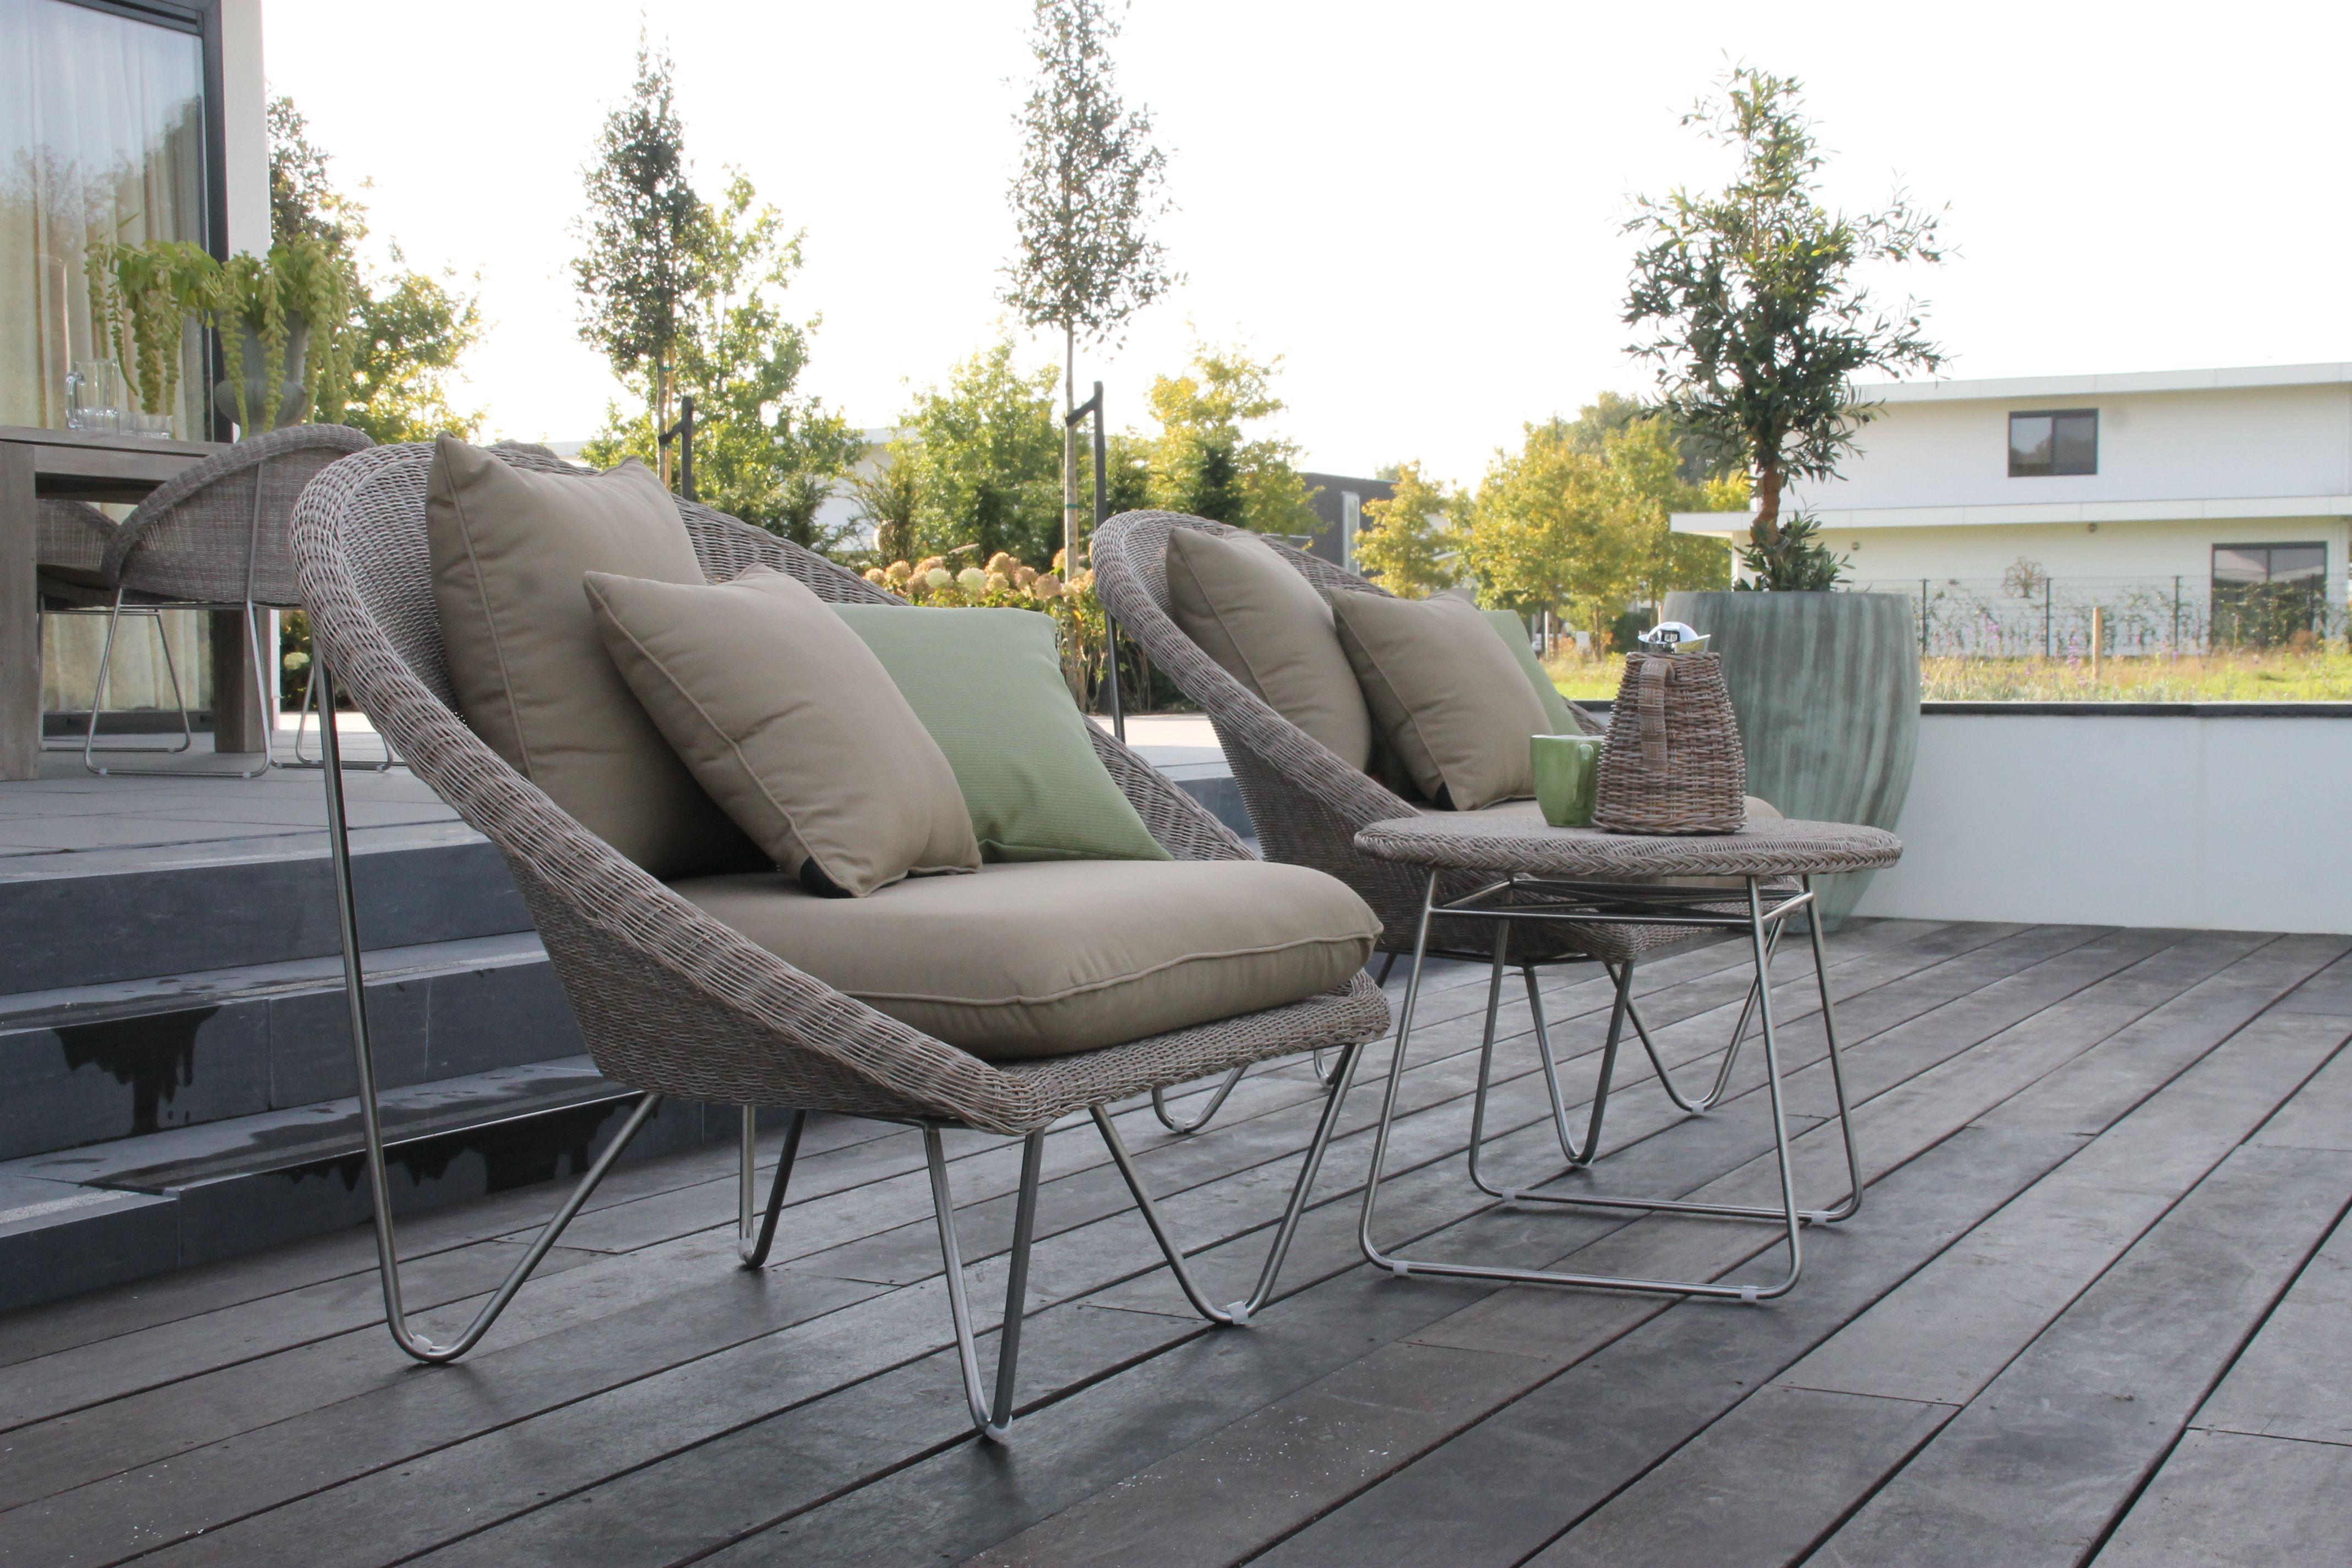 #tuinset #lounge #tuinstoelen #loungestoel #wicker #tuinmeubelen #chair #outdoor #patio #